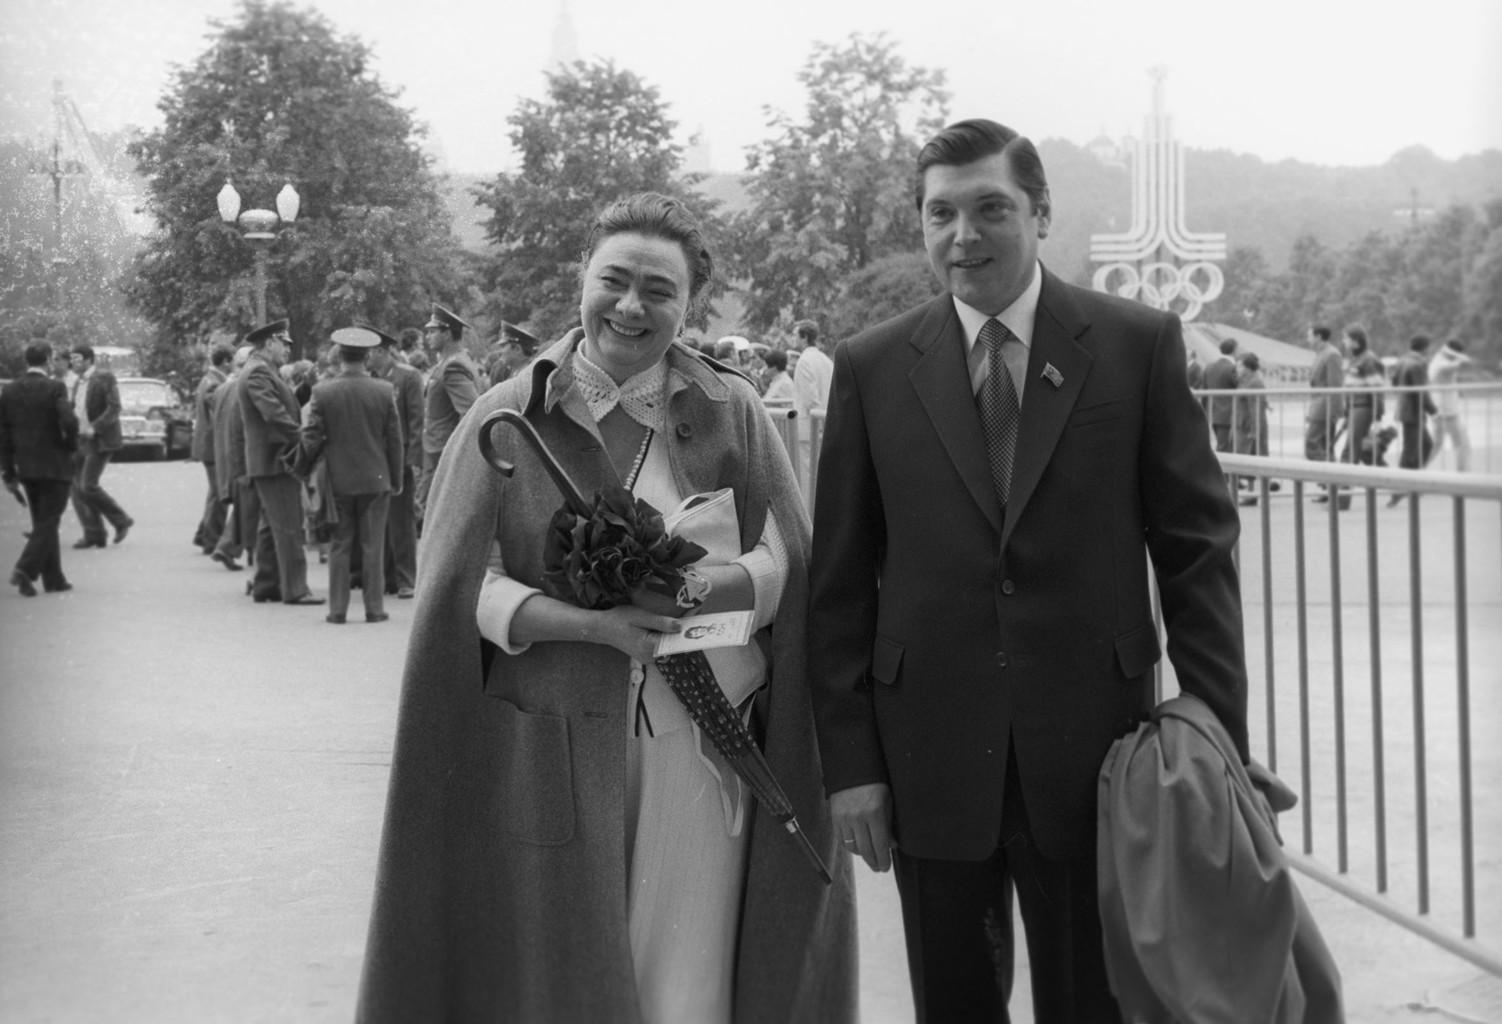 Galina Brezsnyeva és Jurij Csurbanov 1988-ban #moszkvater